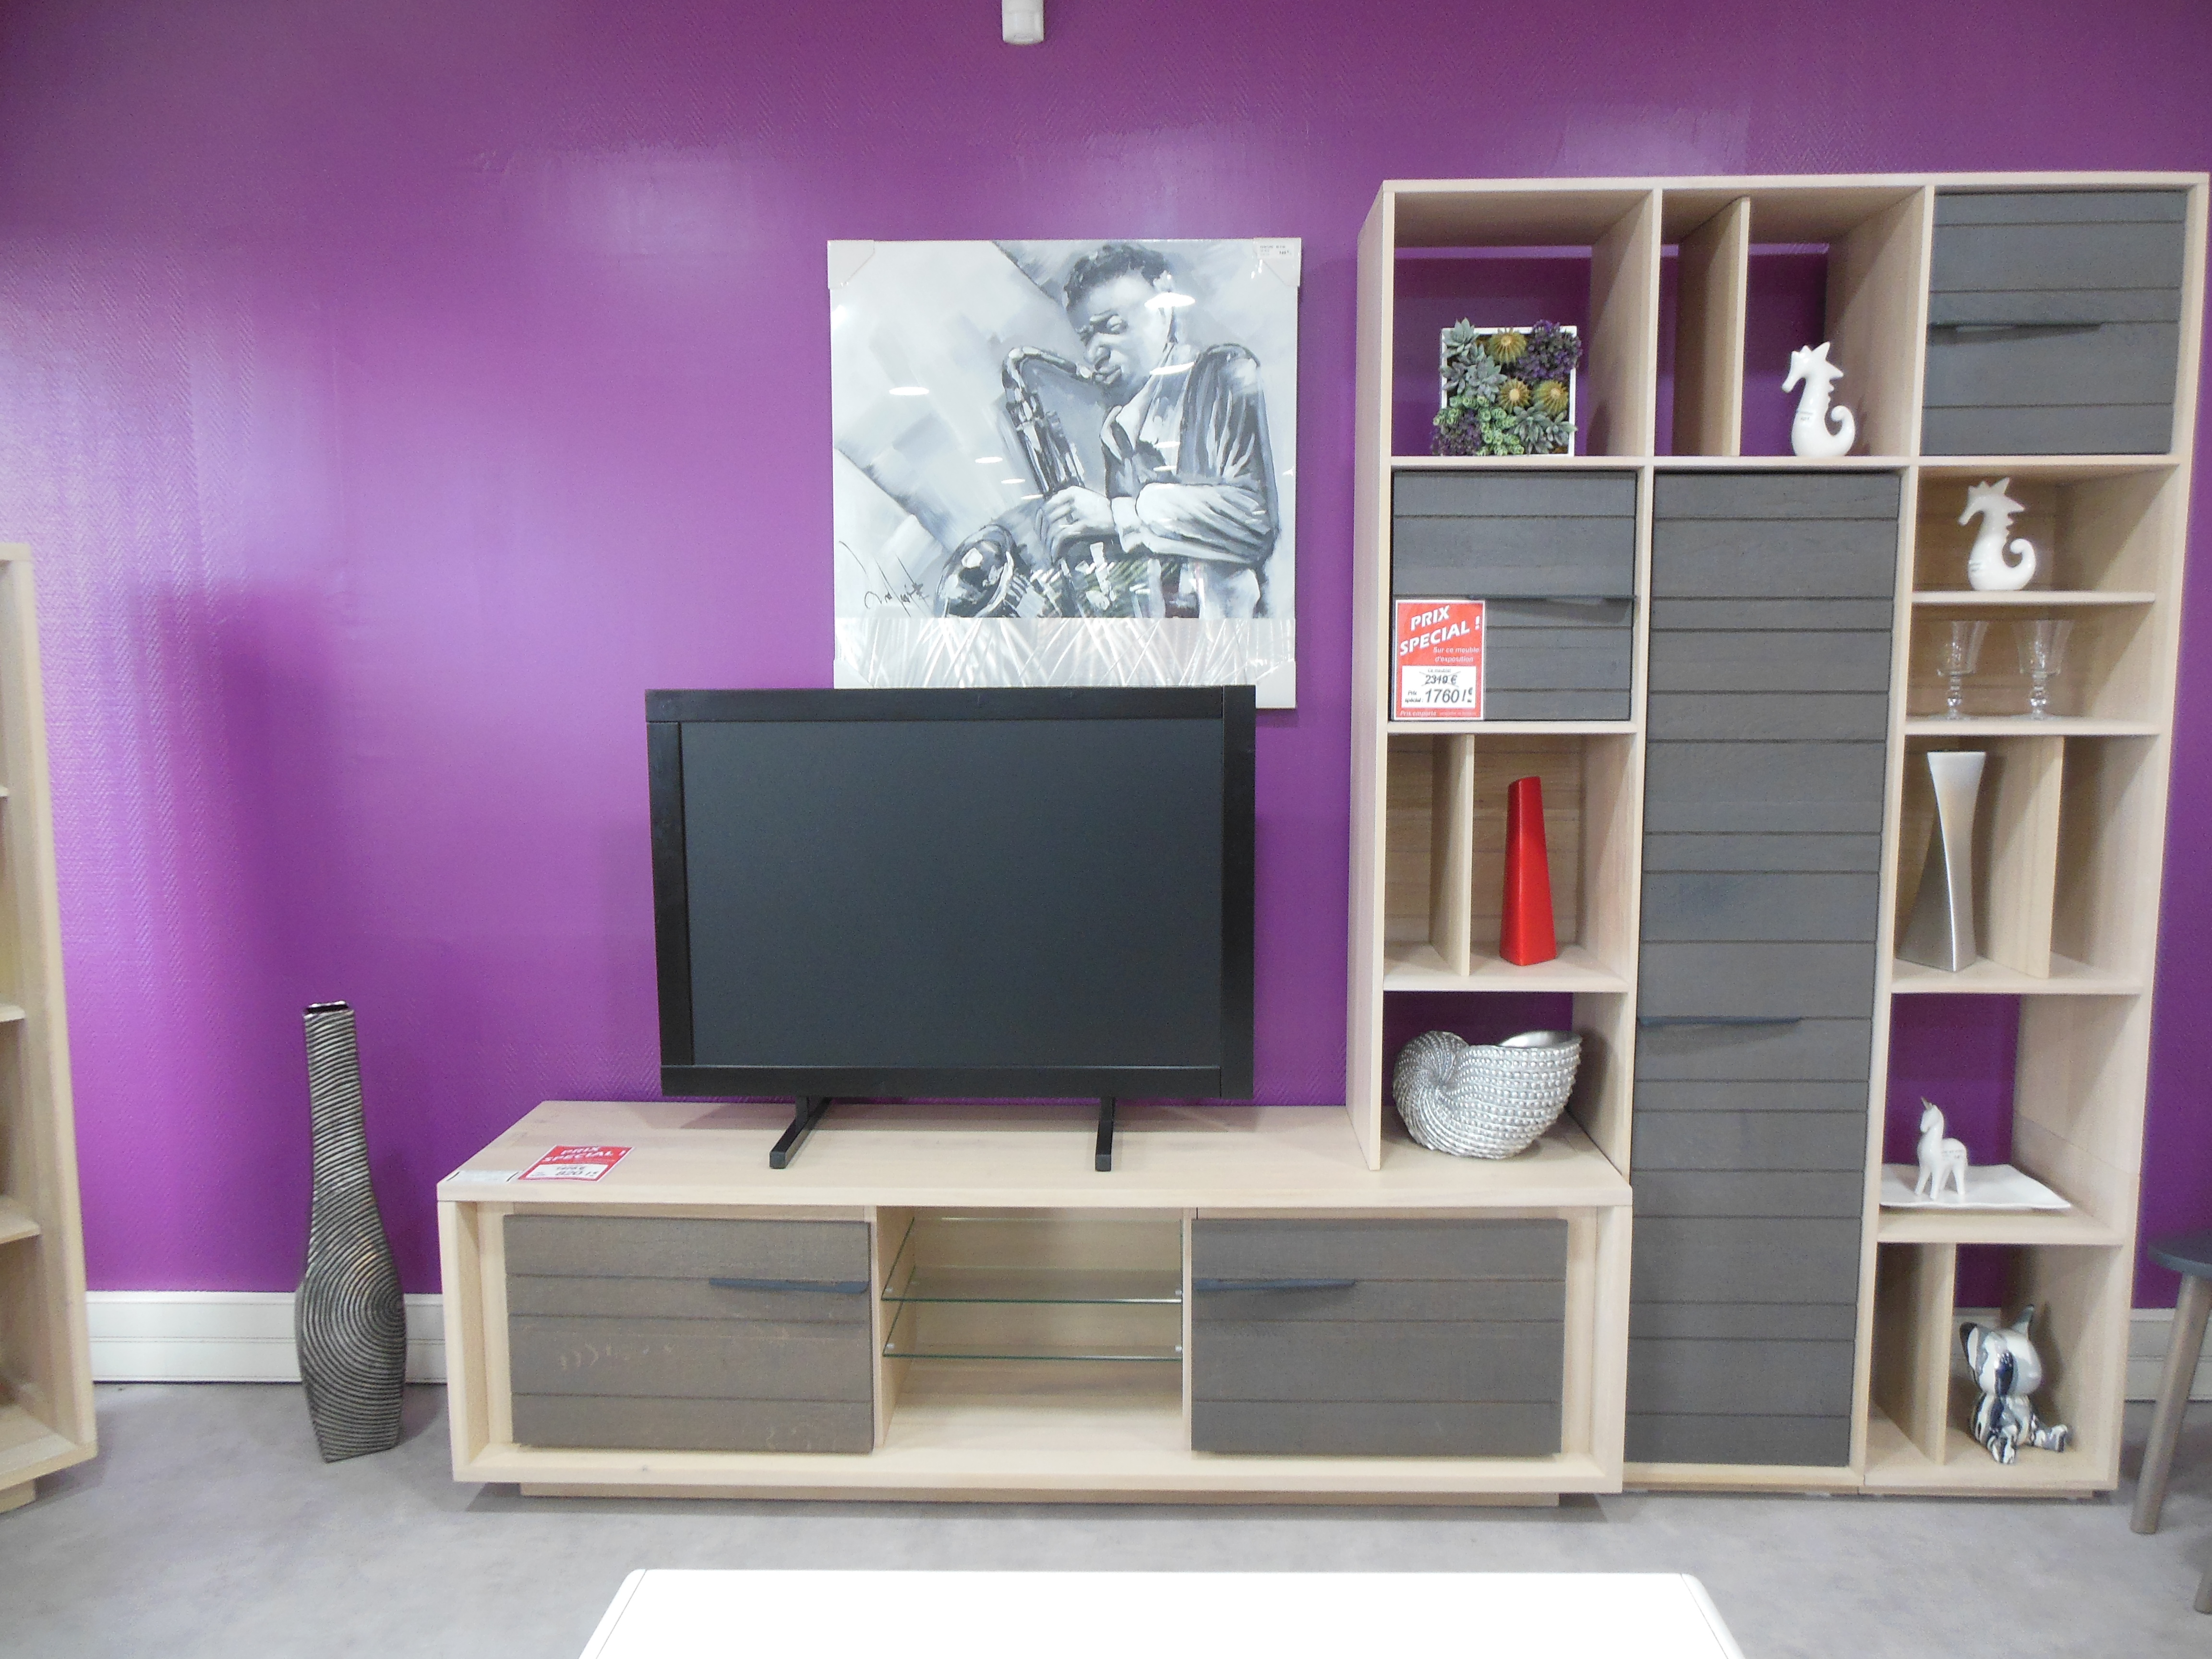 Meuble Tv Bibliothèque Blanc agencement tv composé d'un meuble tv et d'une bibliothèque